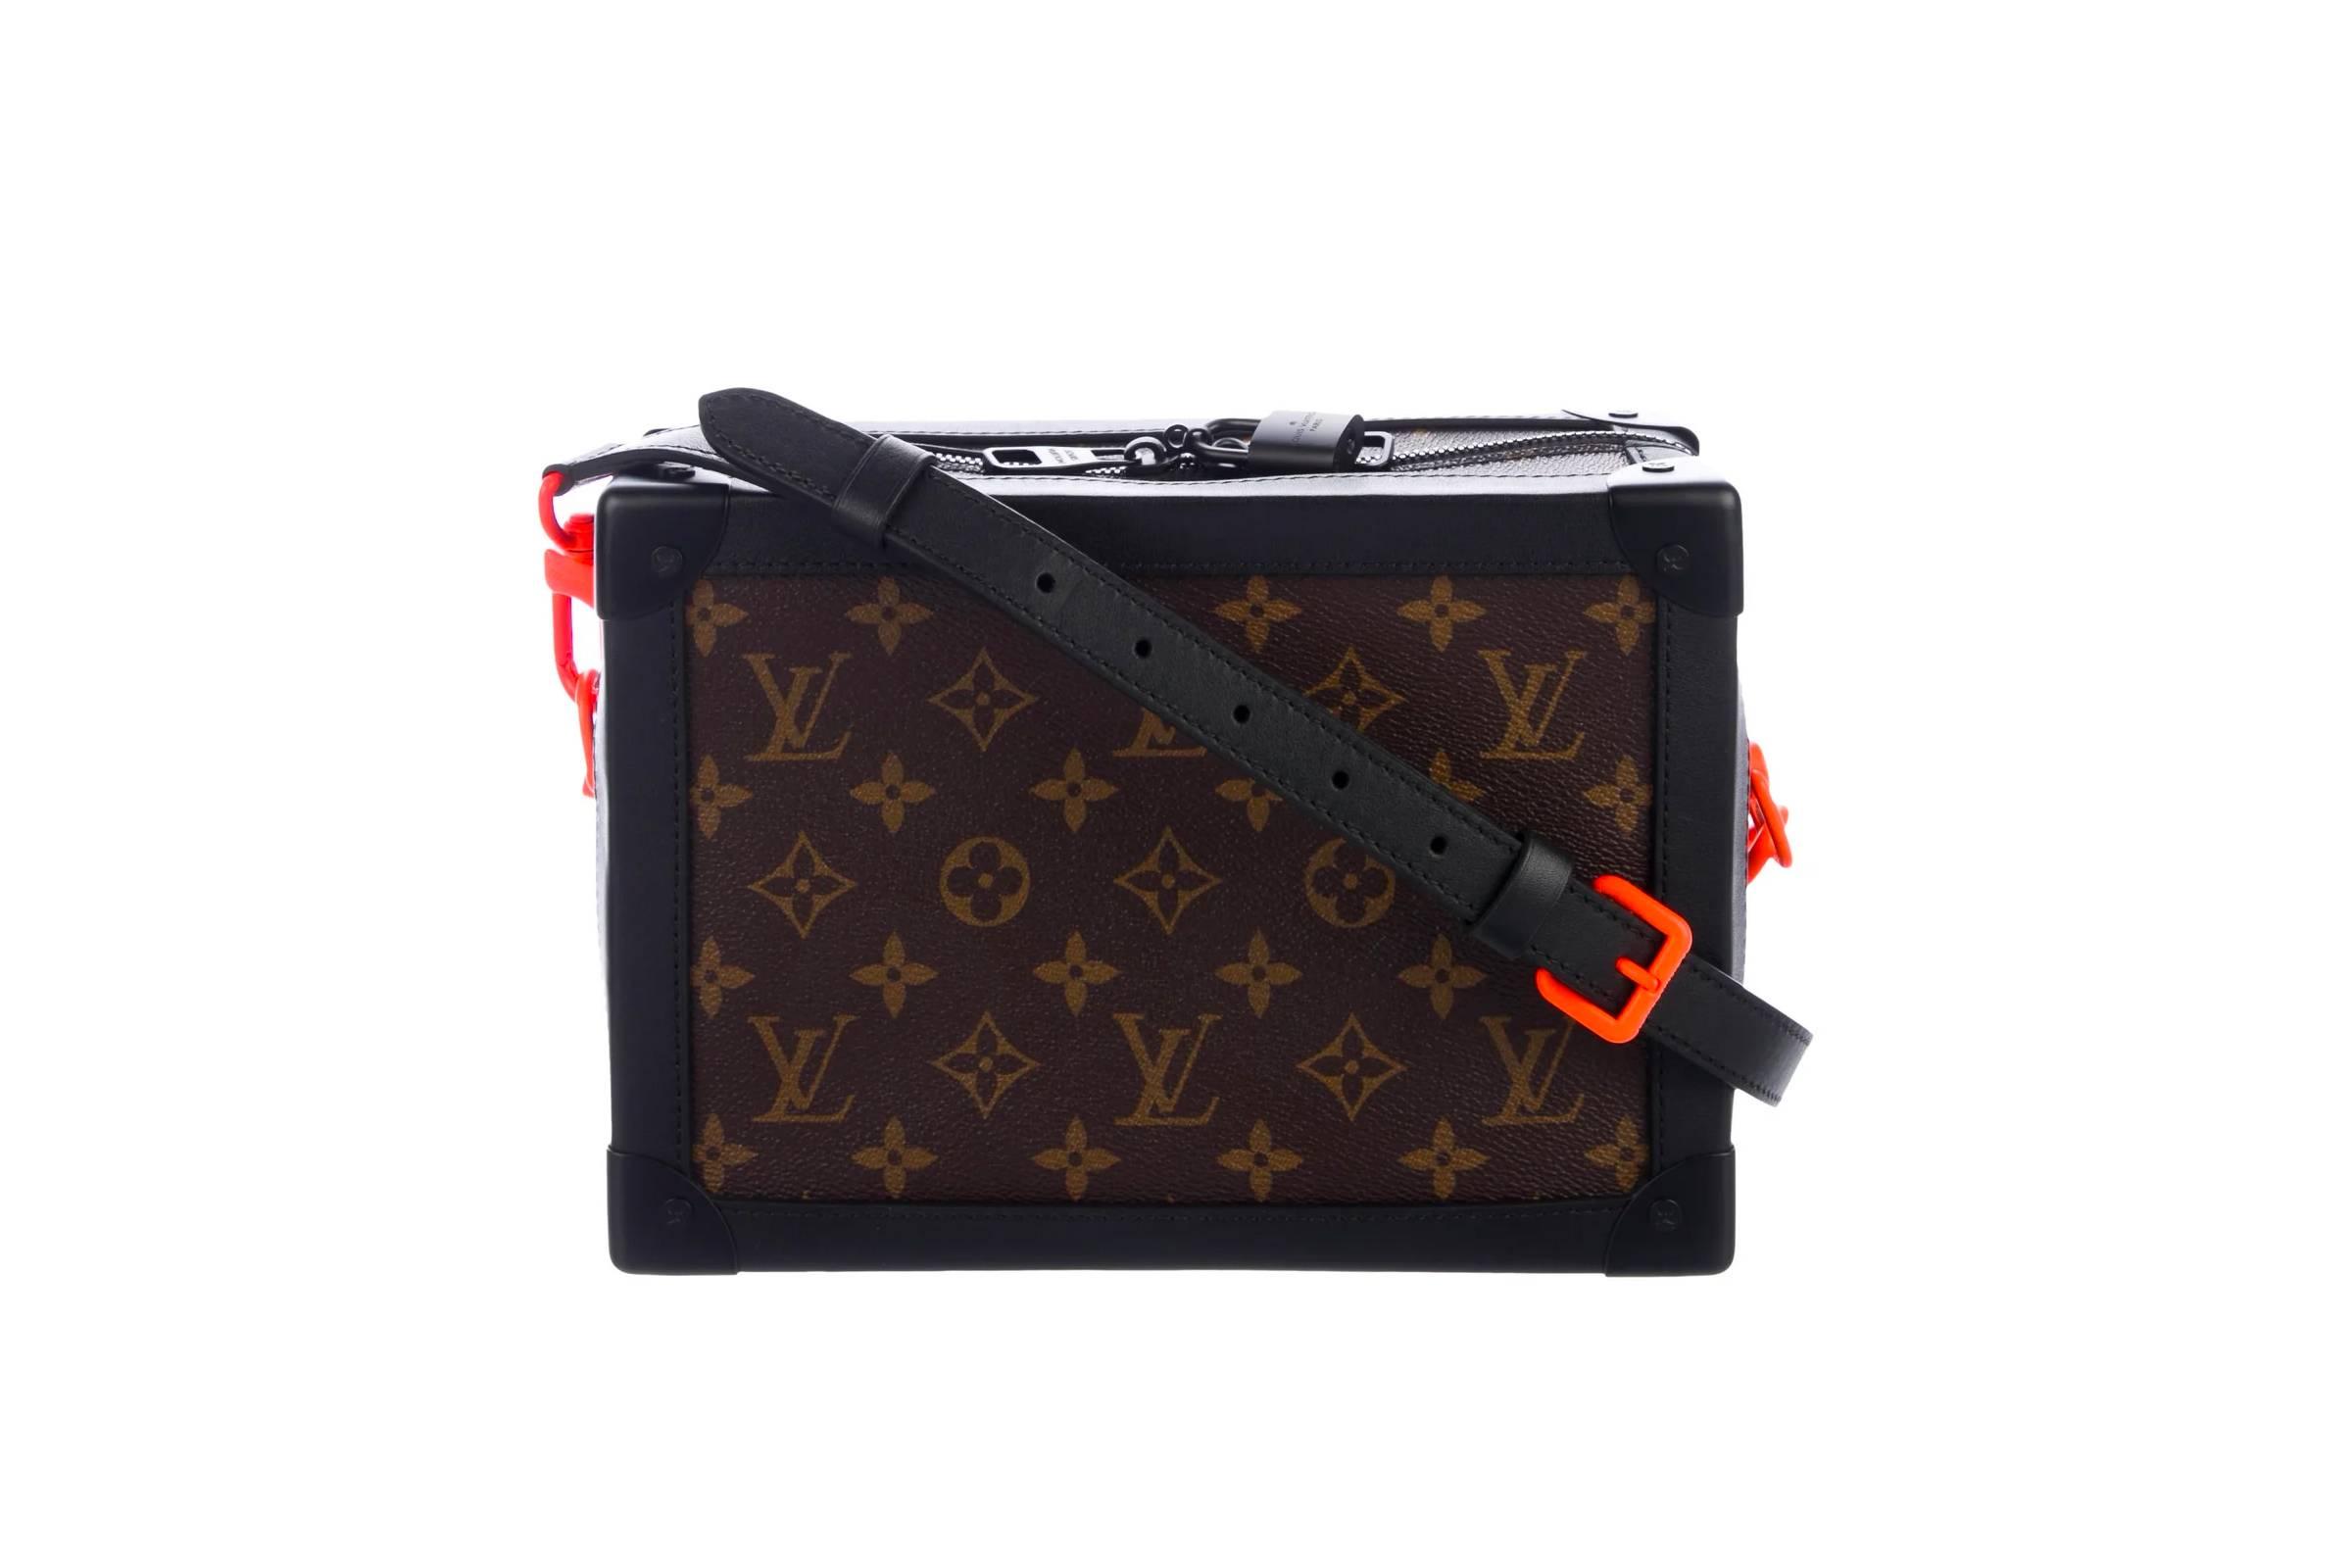 Louis Vuitton Monogram Soft Trunk Bag